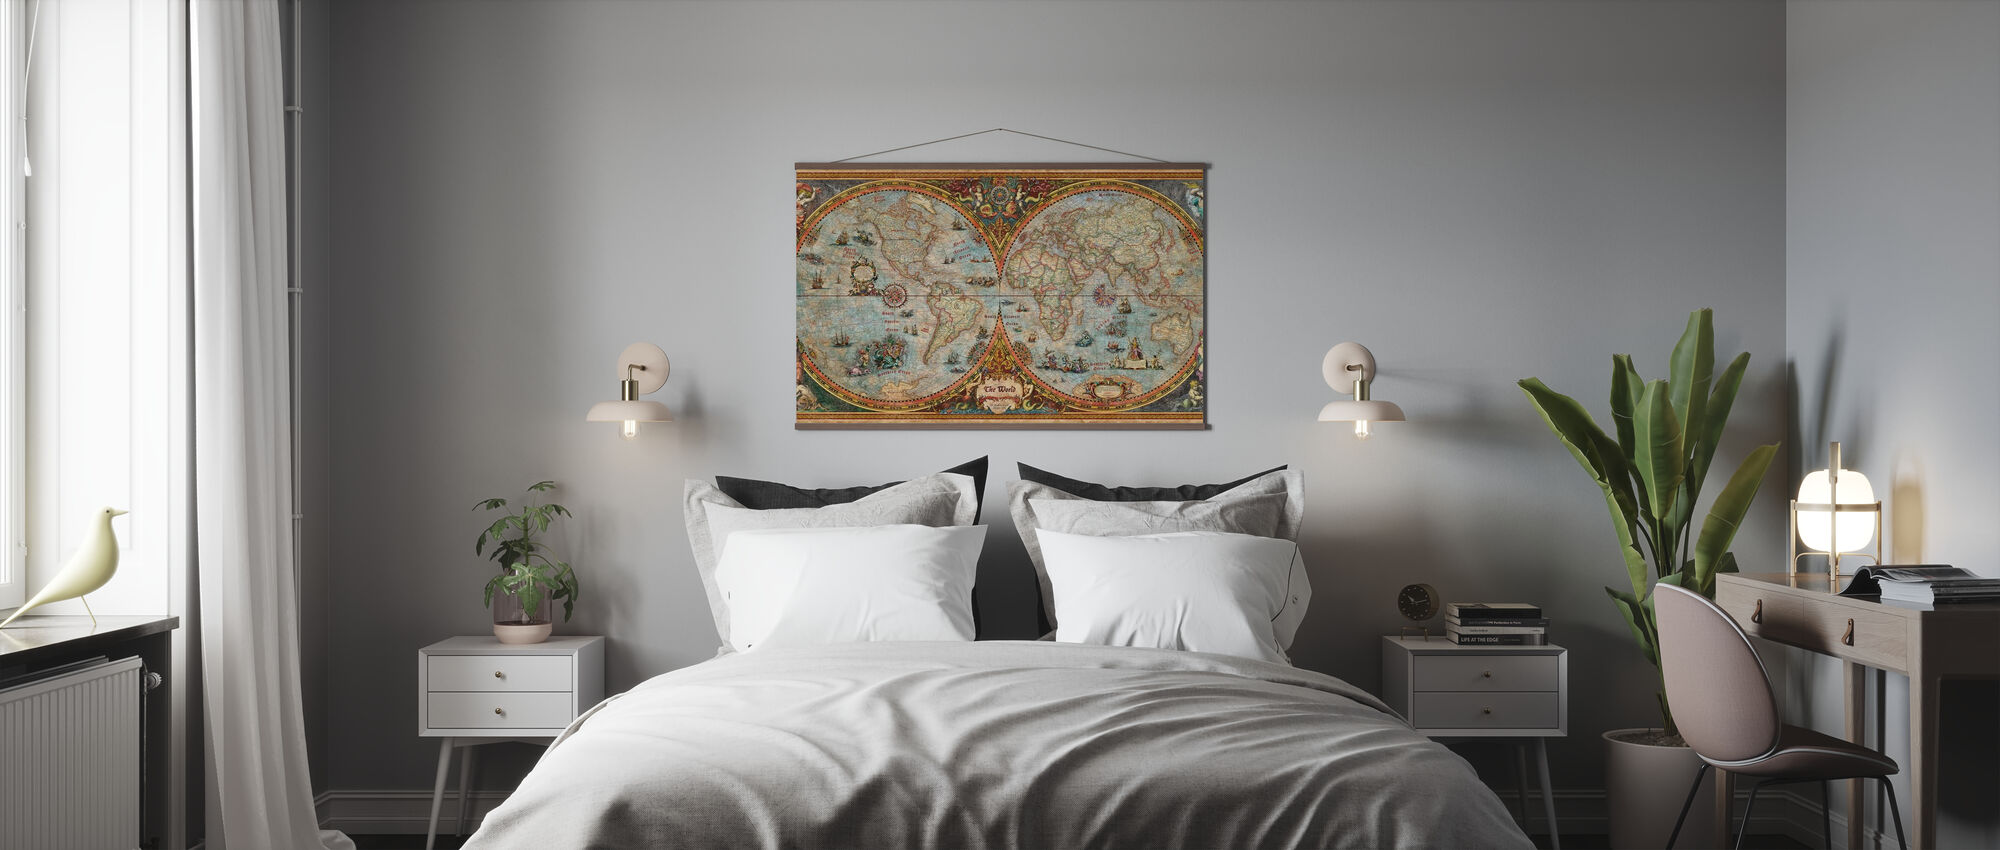 Hemisphere Kaart - Poster - Slaapkamer